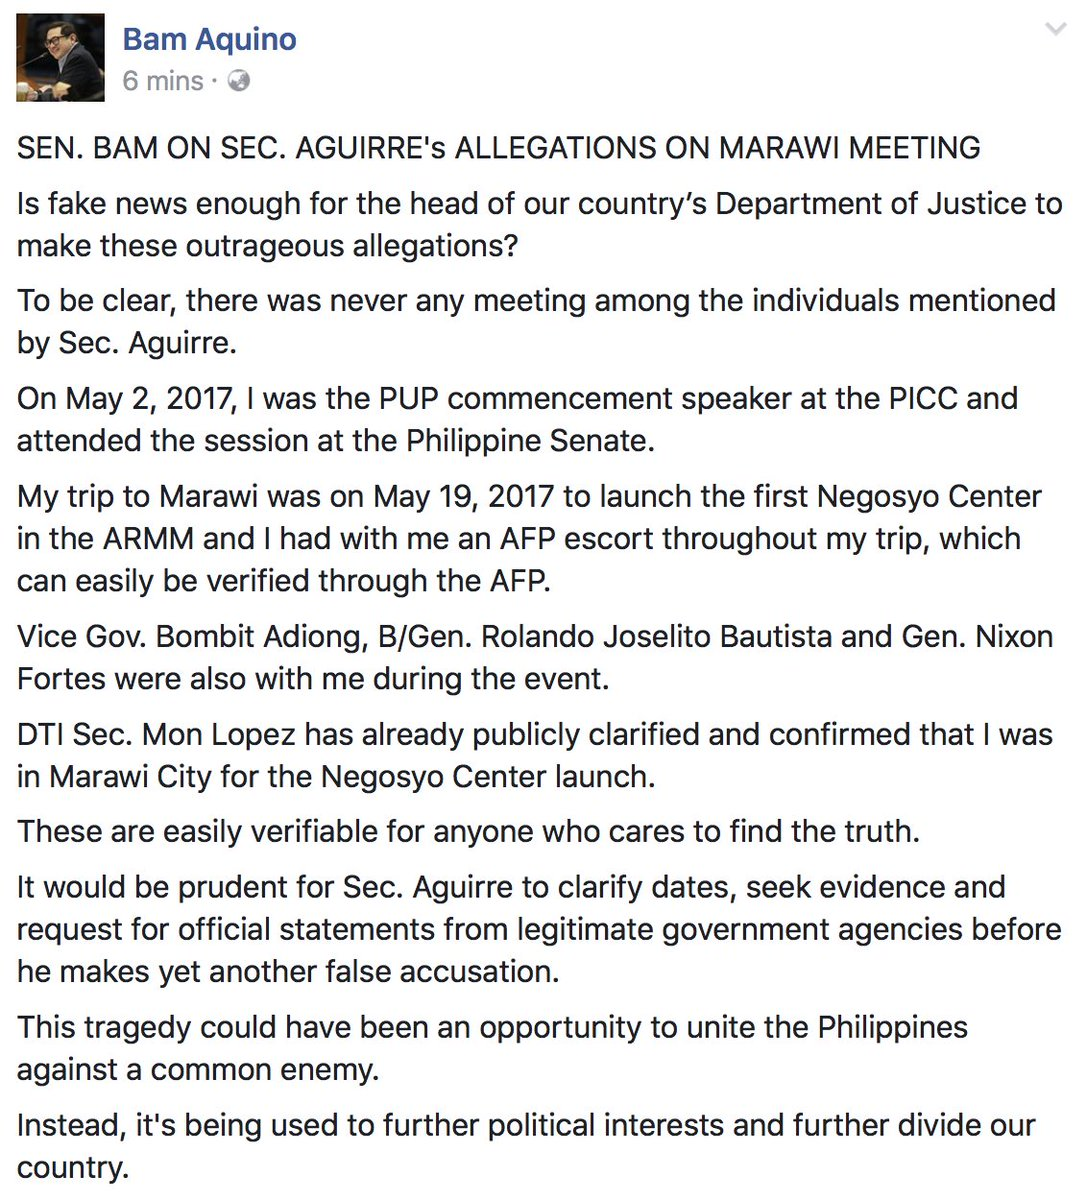 Sen. Bam Aquino replied to DOJ Sec 'Systems Glitch' Aguirre #AguirreLinks   https://t.co/AprZeXaiX4 https://t.co/9hRQV869QY